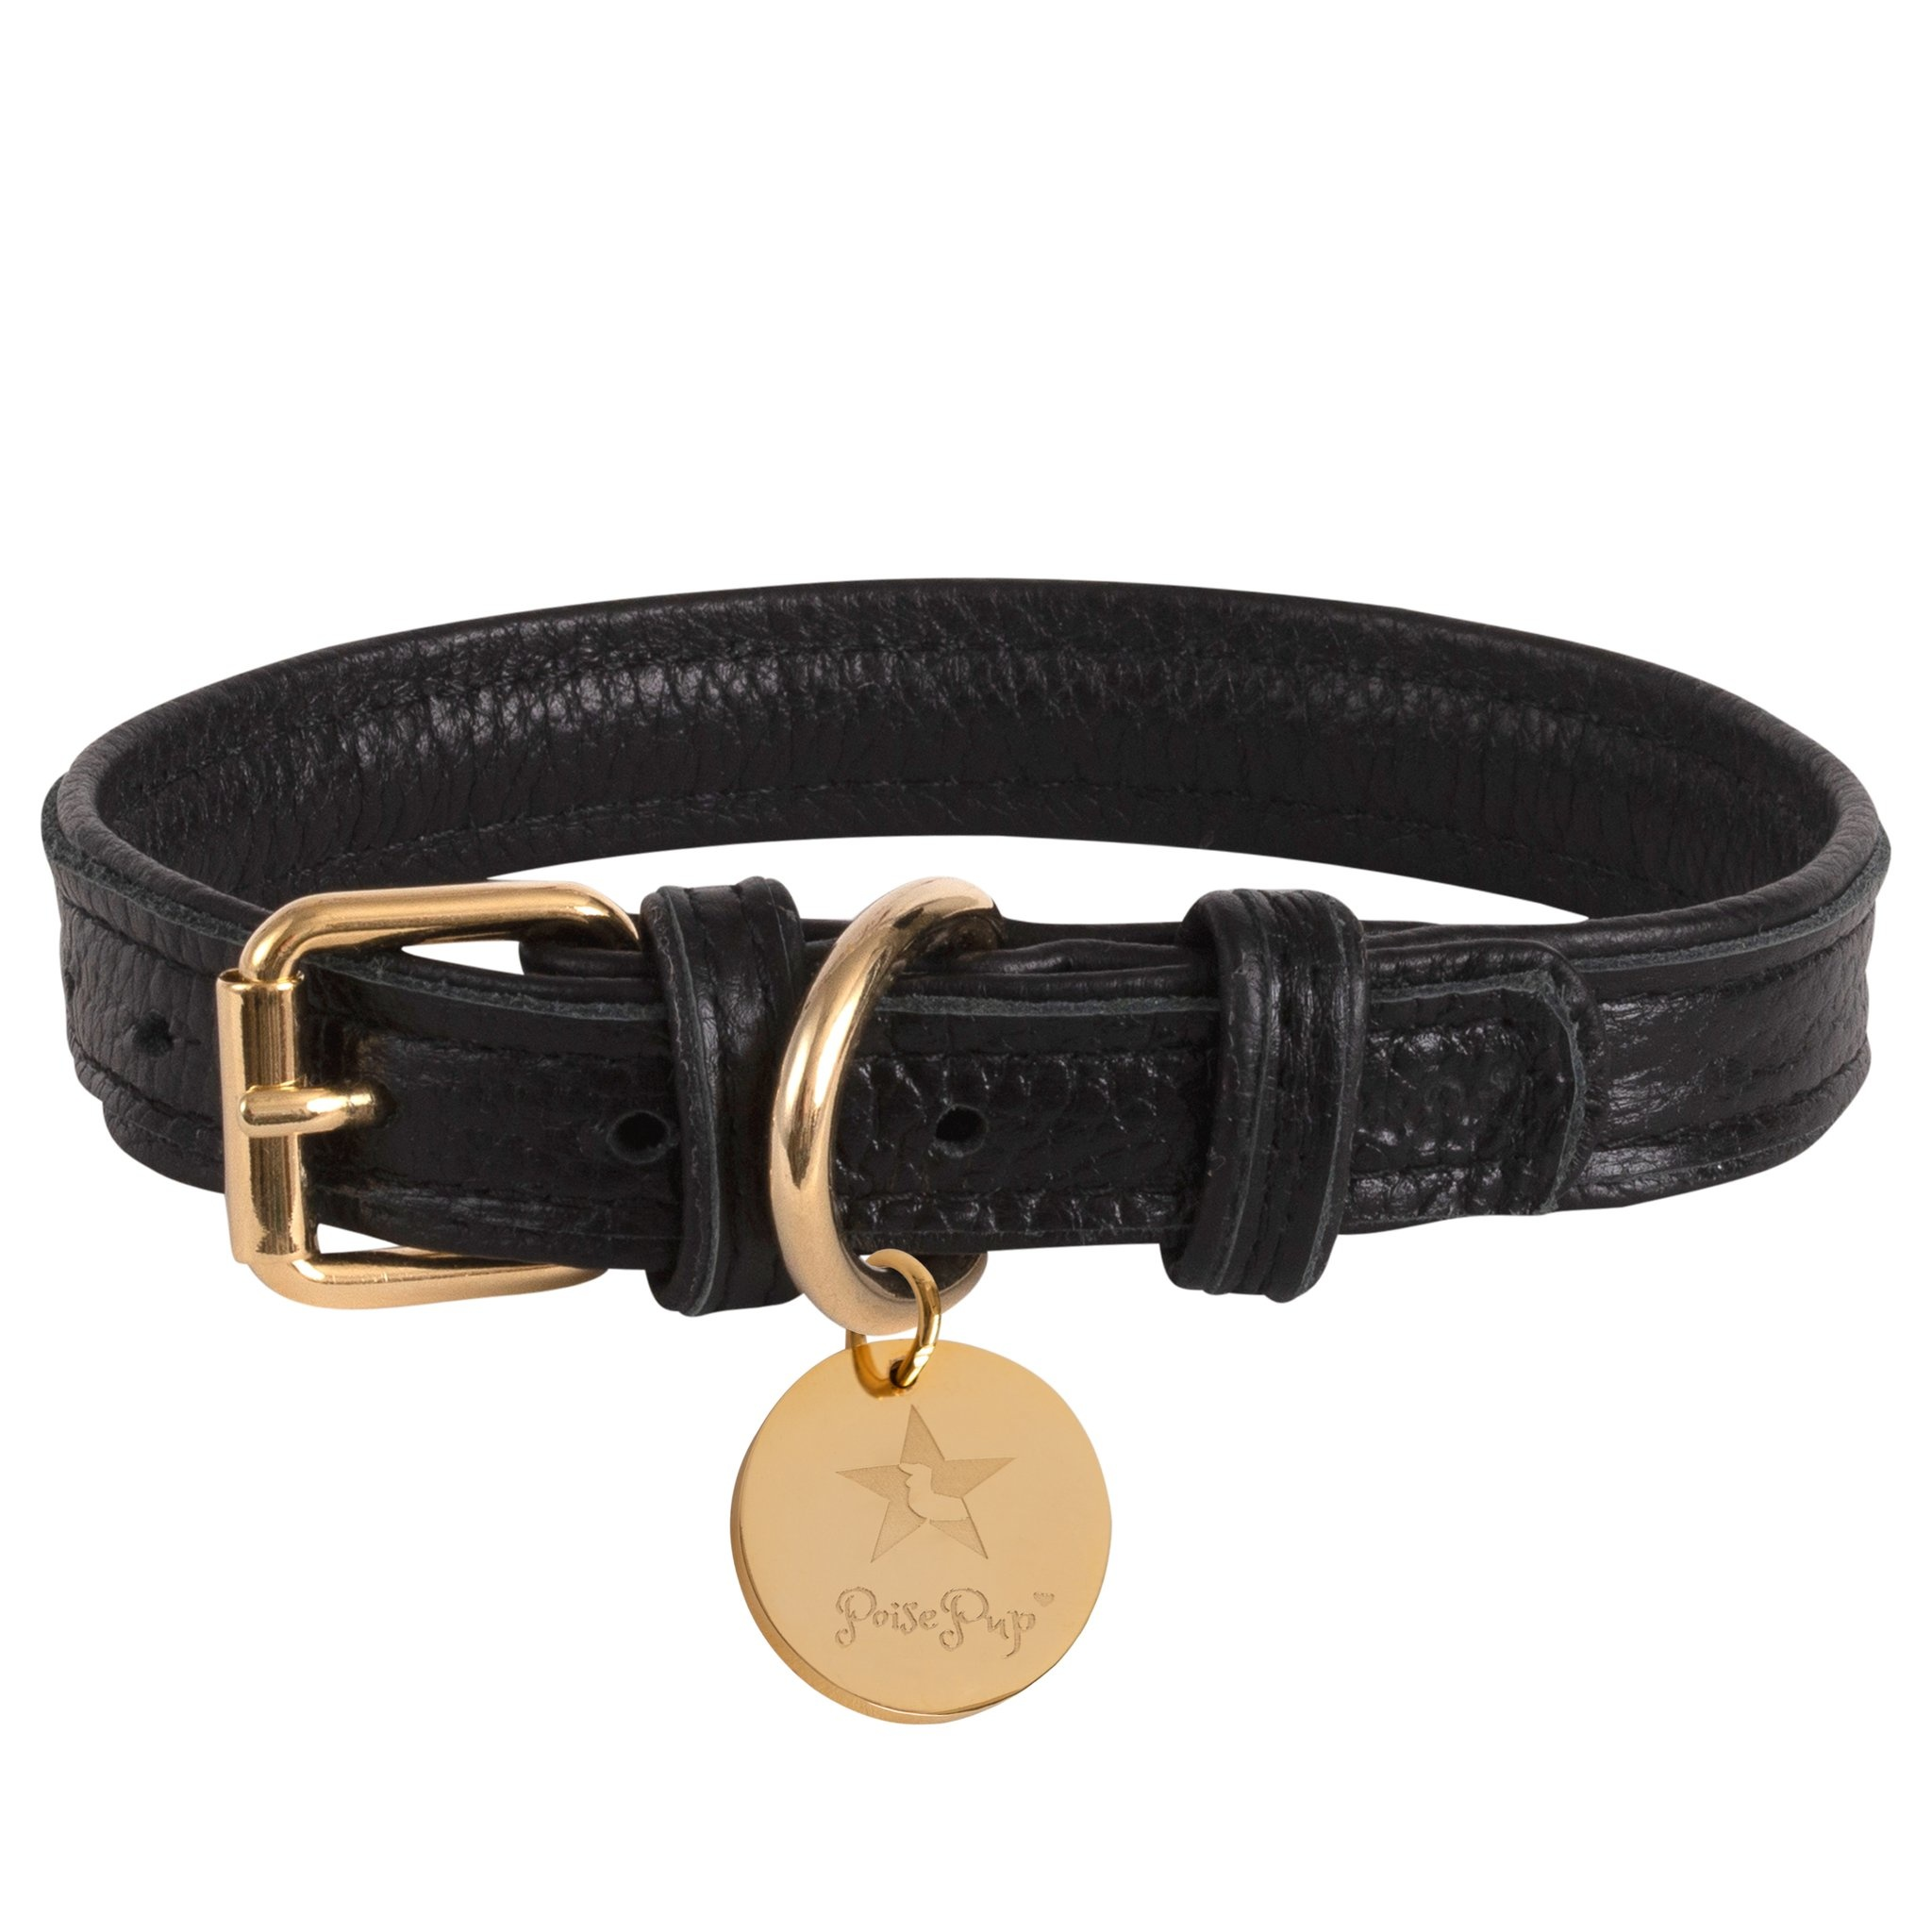 Poise Pup Collar Dark Night Leather